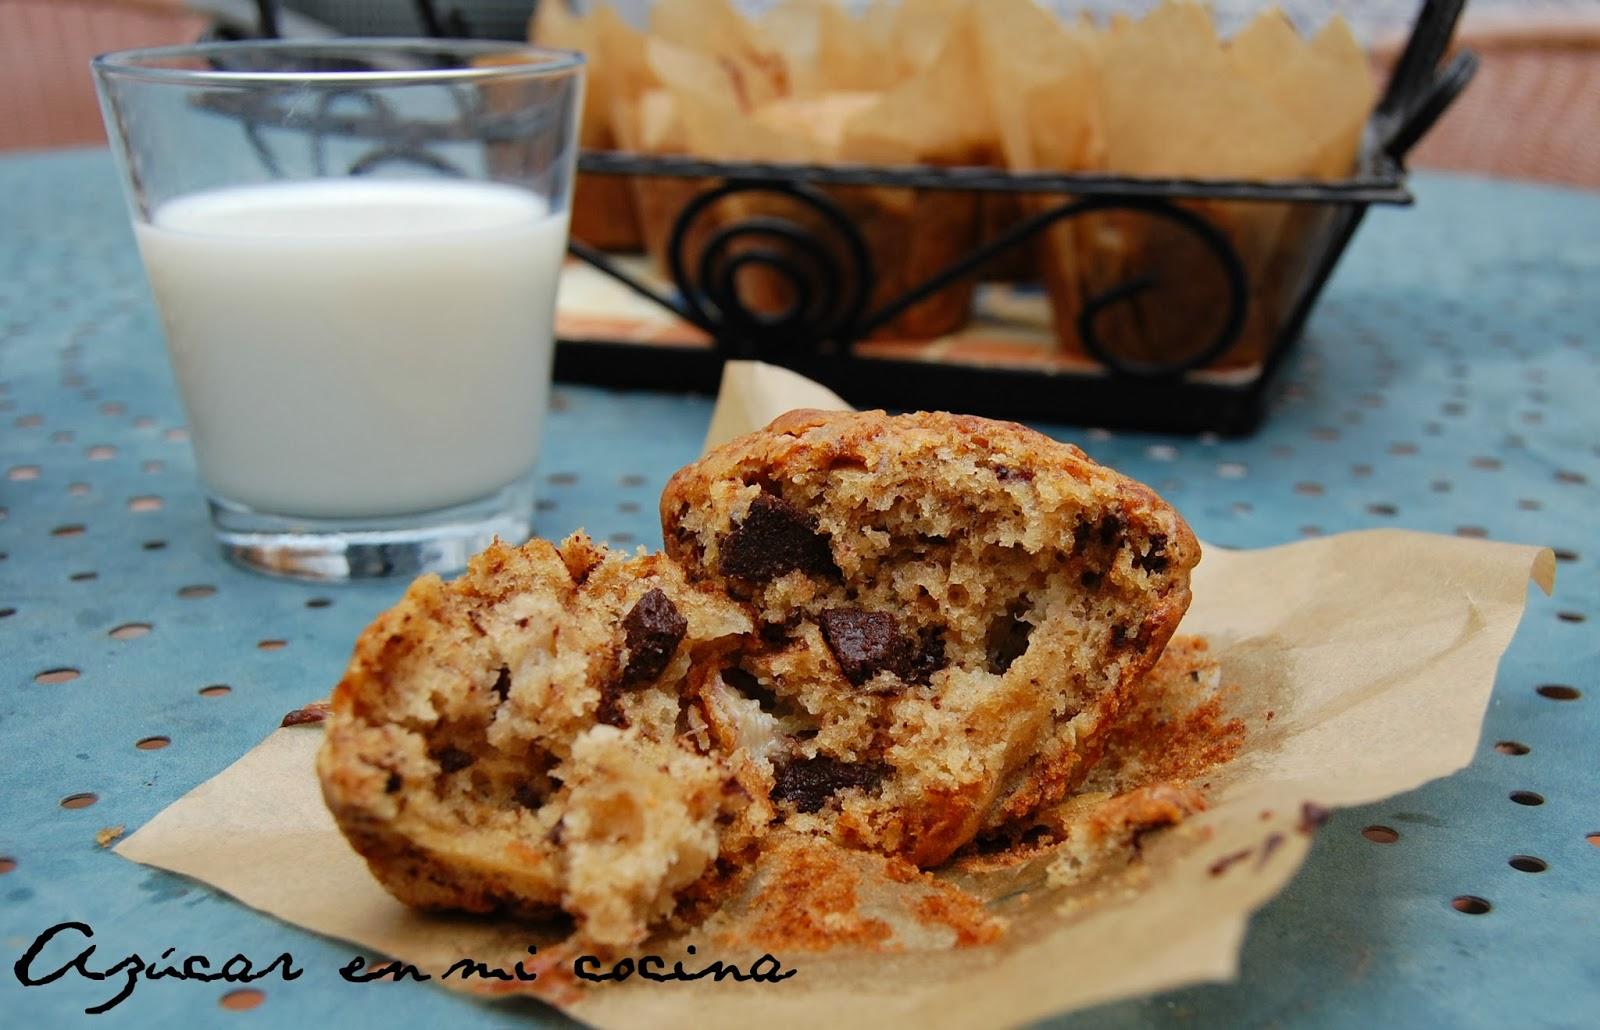 http://azucarenmicocina.blogspot.com.es/2013/11/muffins-de-platano-y-chip-de-chocolate.html